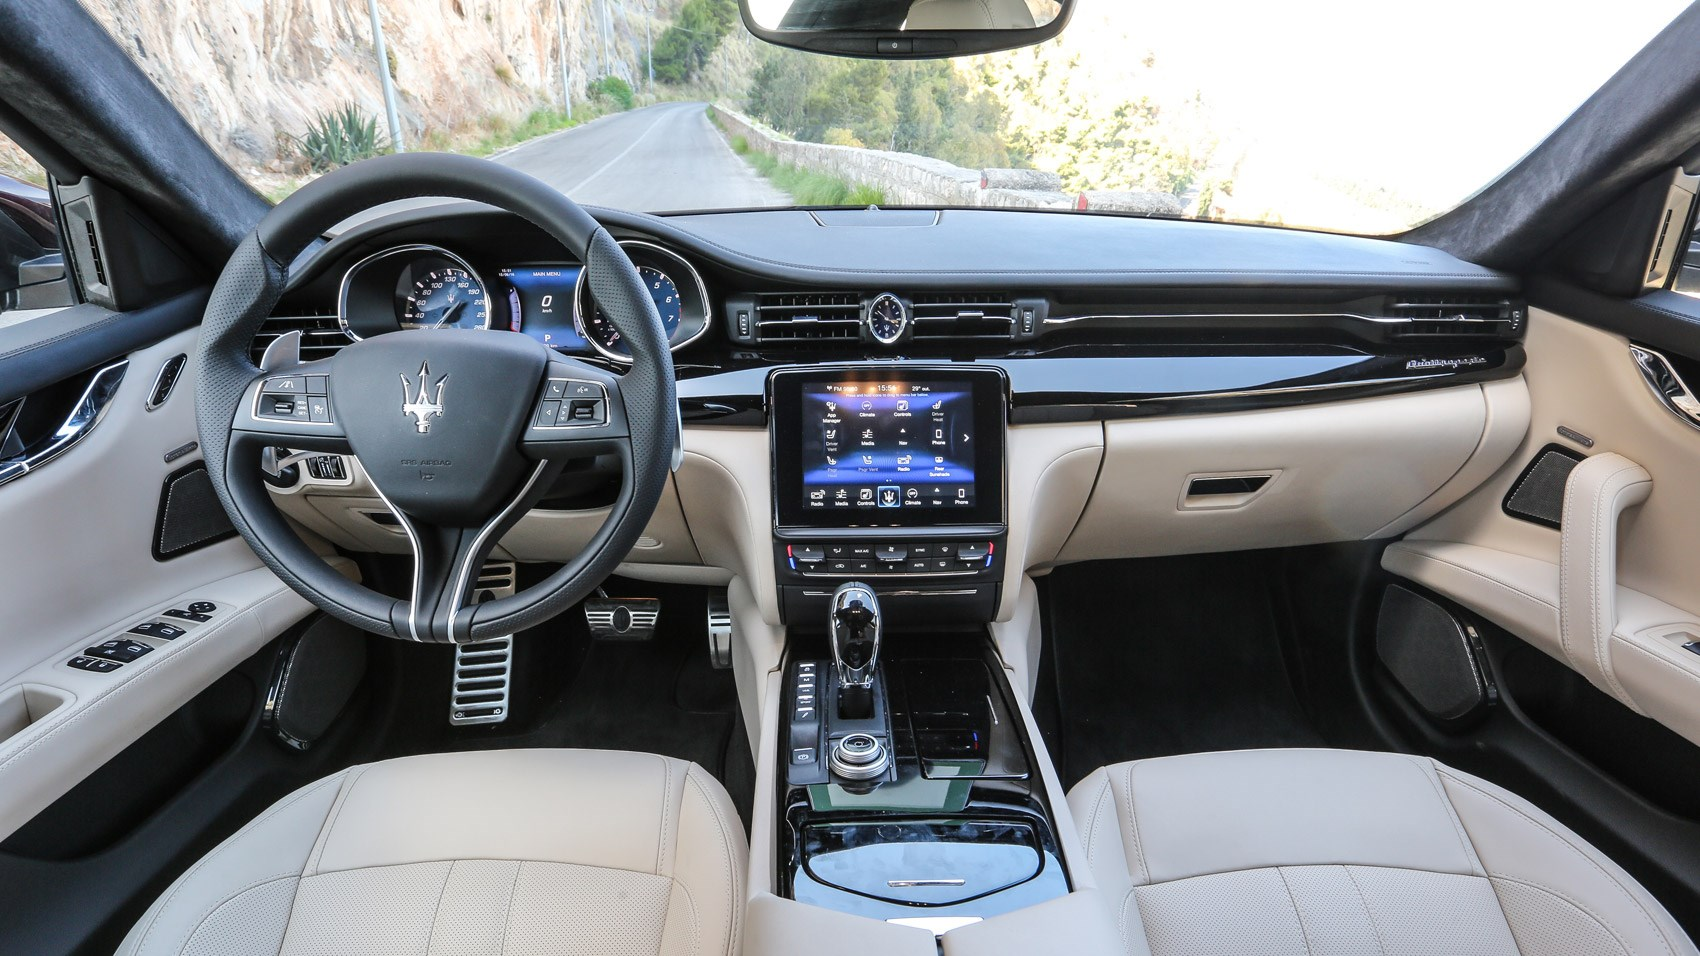 Best Lease Deals 2017 >> Maserati Quattroporte GranSport S (2018) review | CAR Magazine